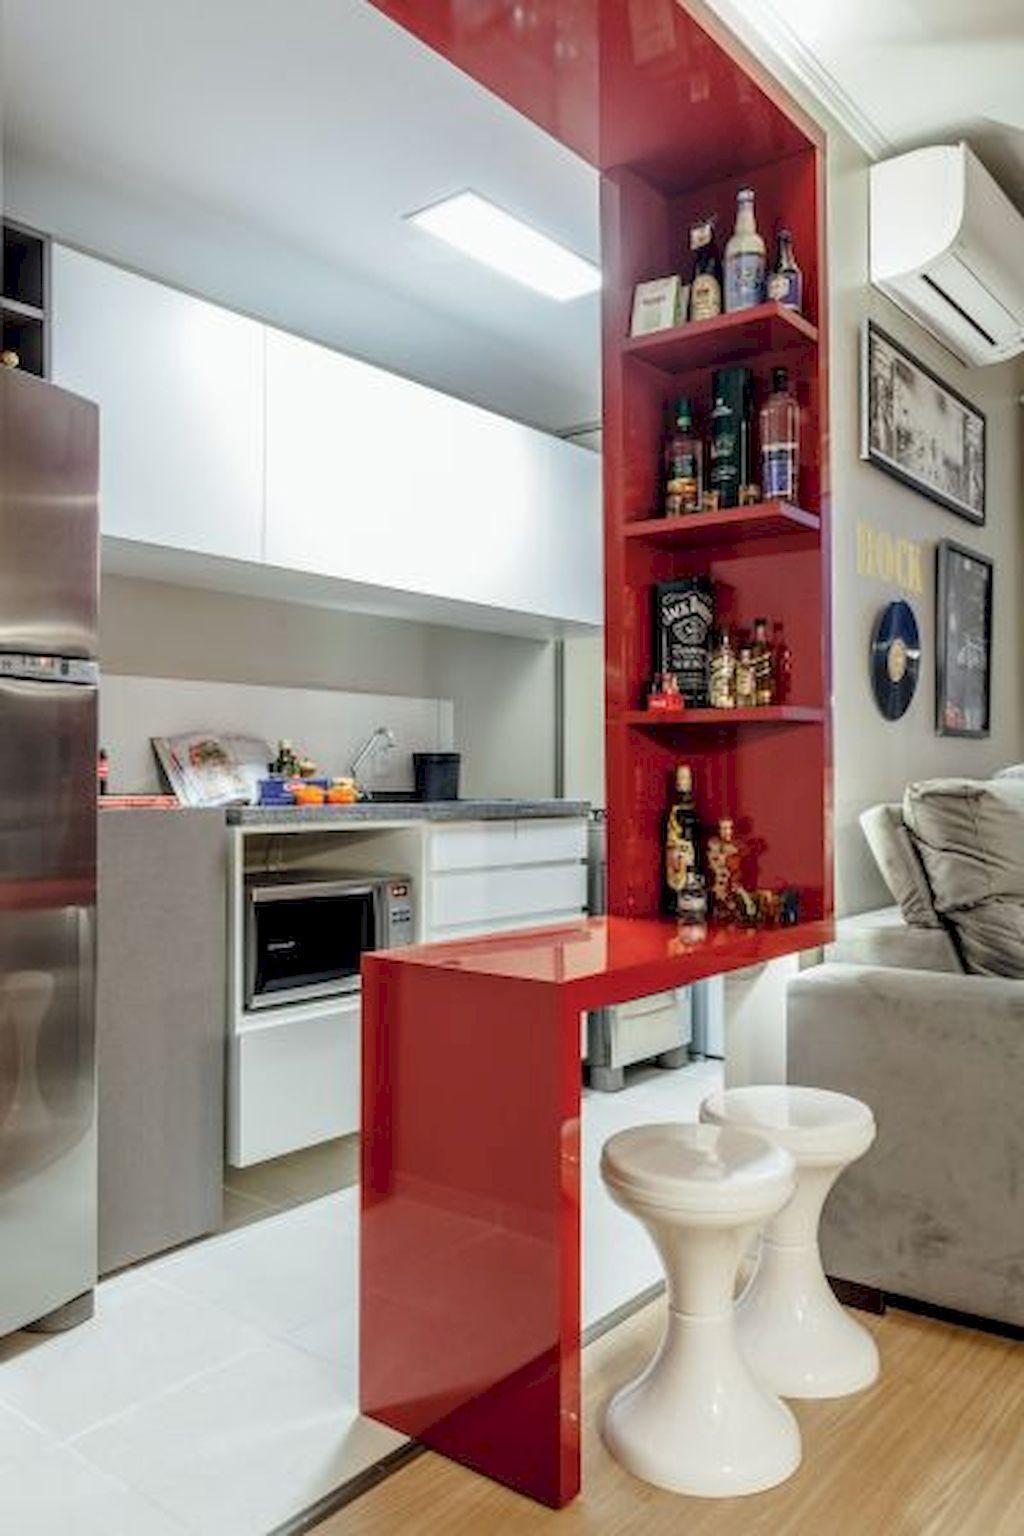 Adorable the best of little apartment kitchen decor https homeofpondo also design kitchendesign interior in rh pinterest